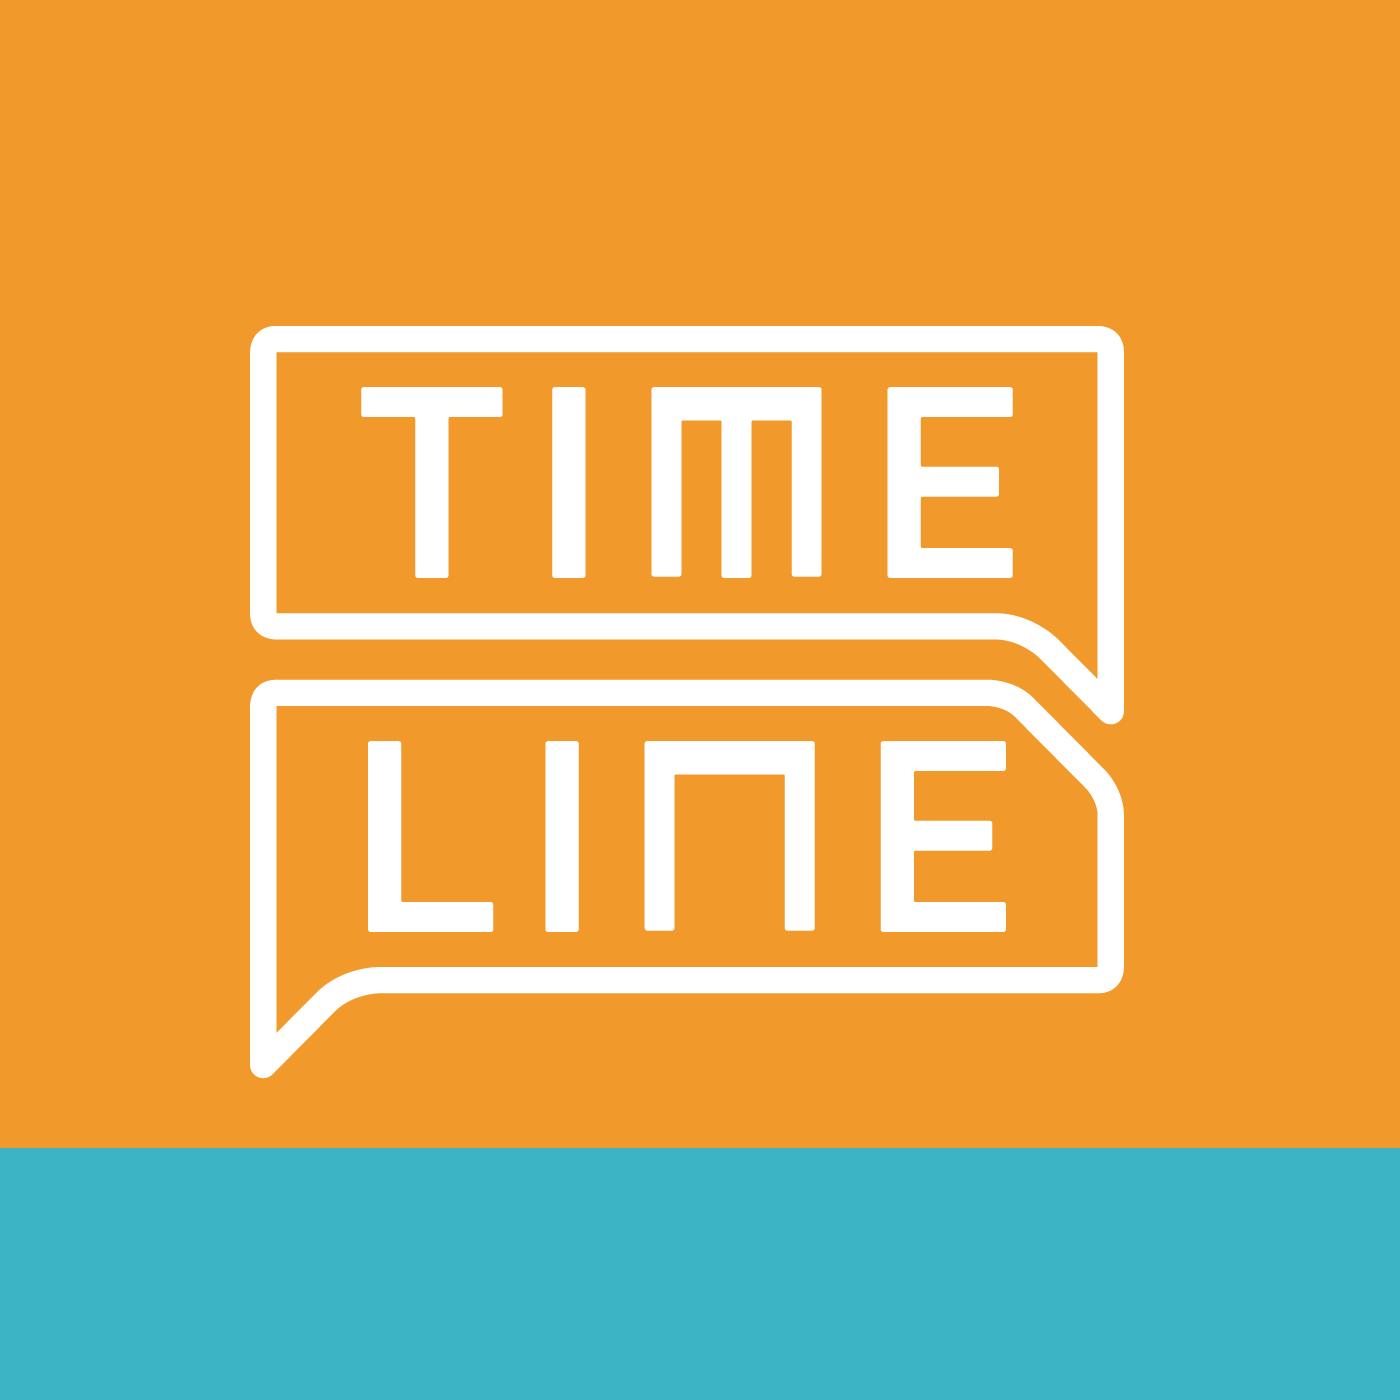 Timeline Gaúcha 14/12/2017